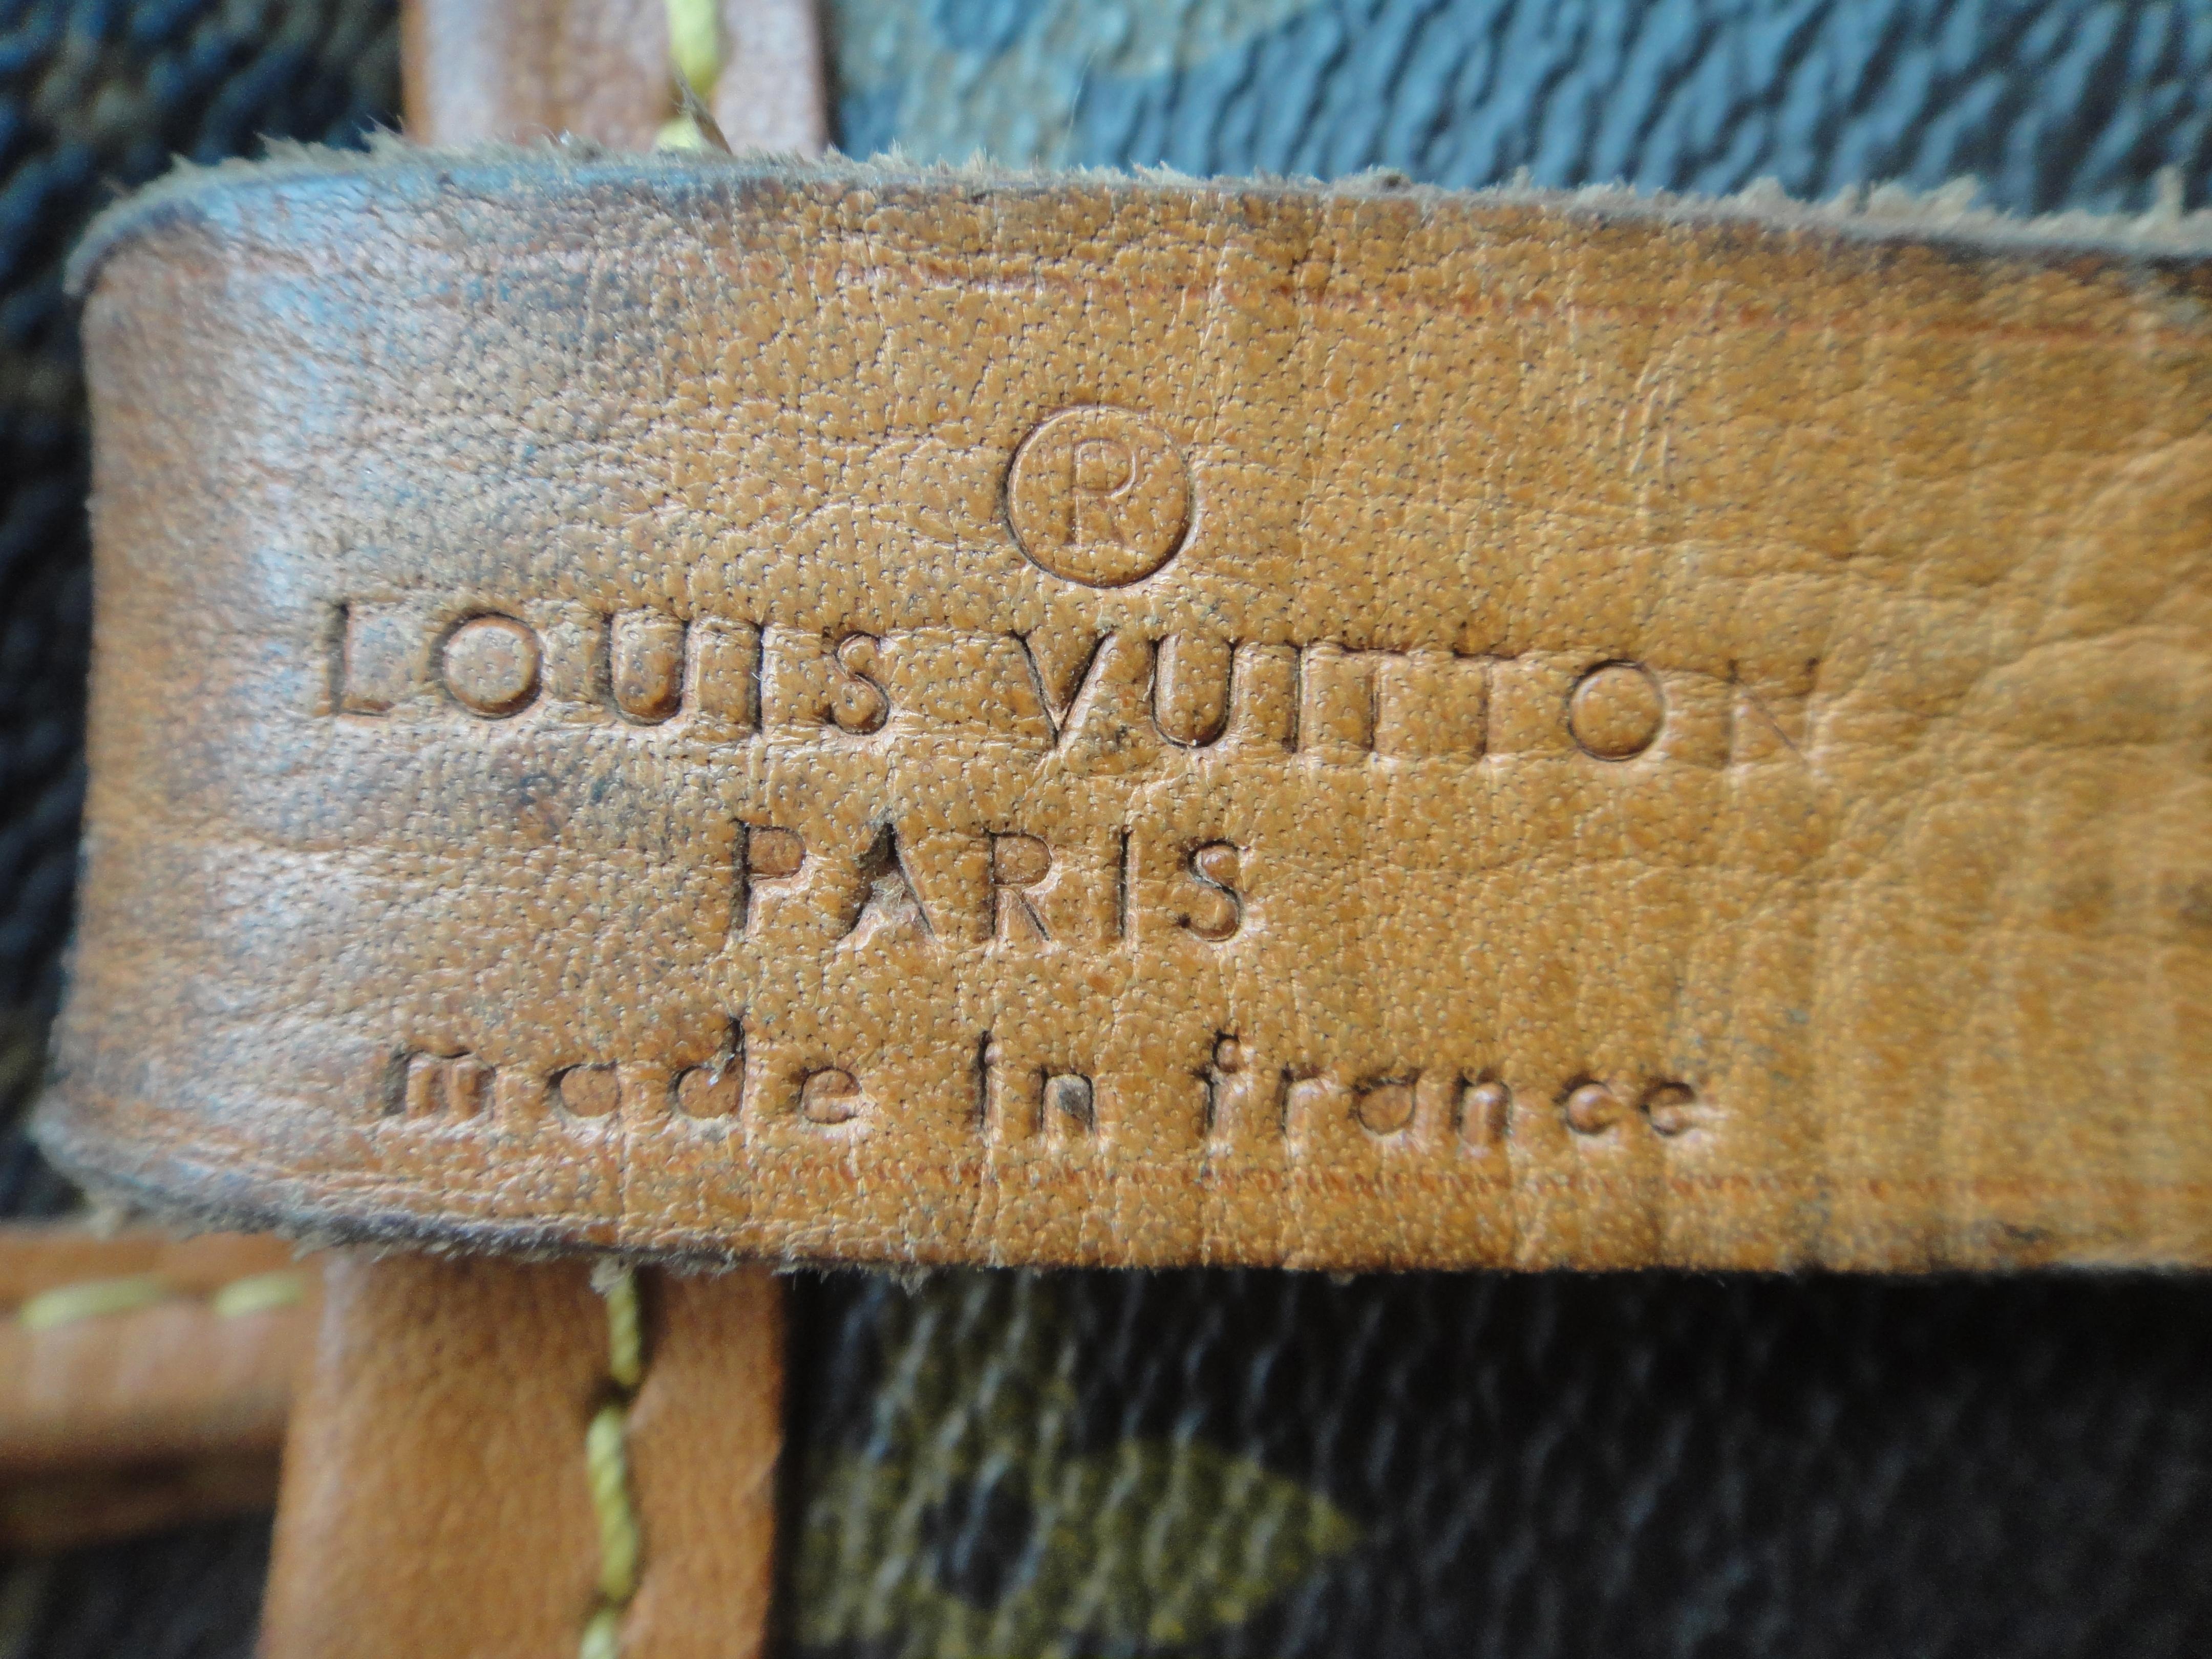 Louis Vuitton stamp